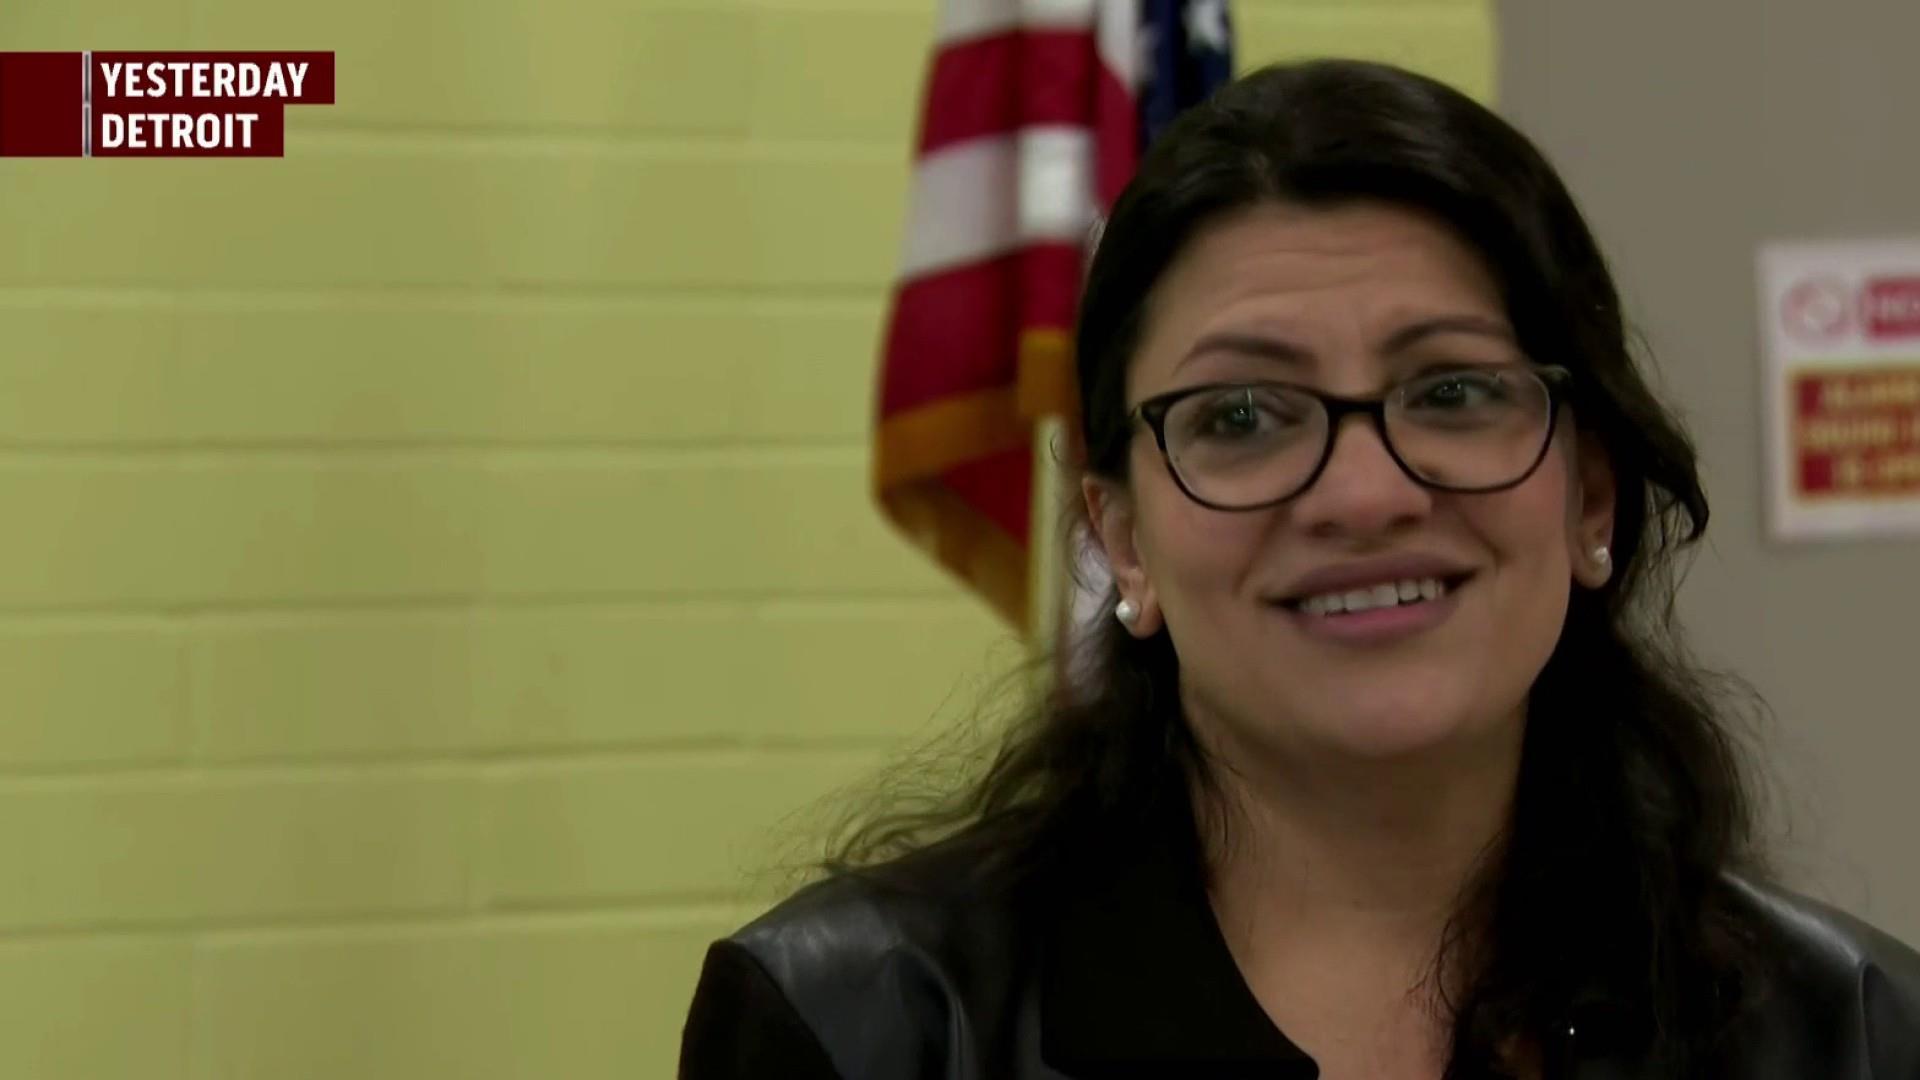 A congresswoman's teachable moment